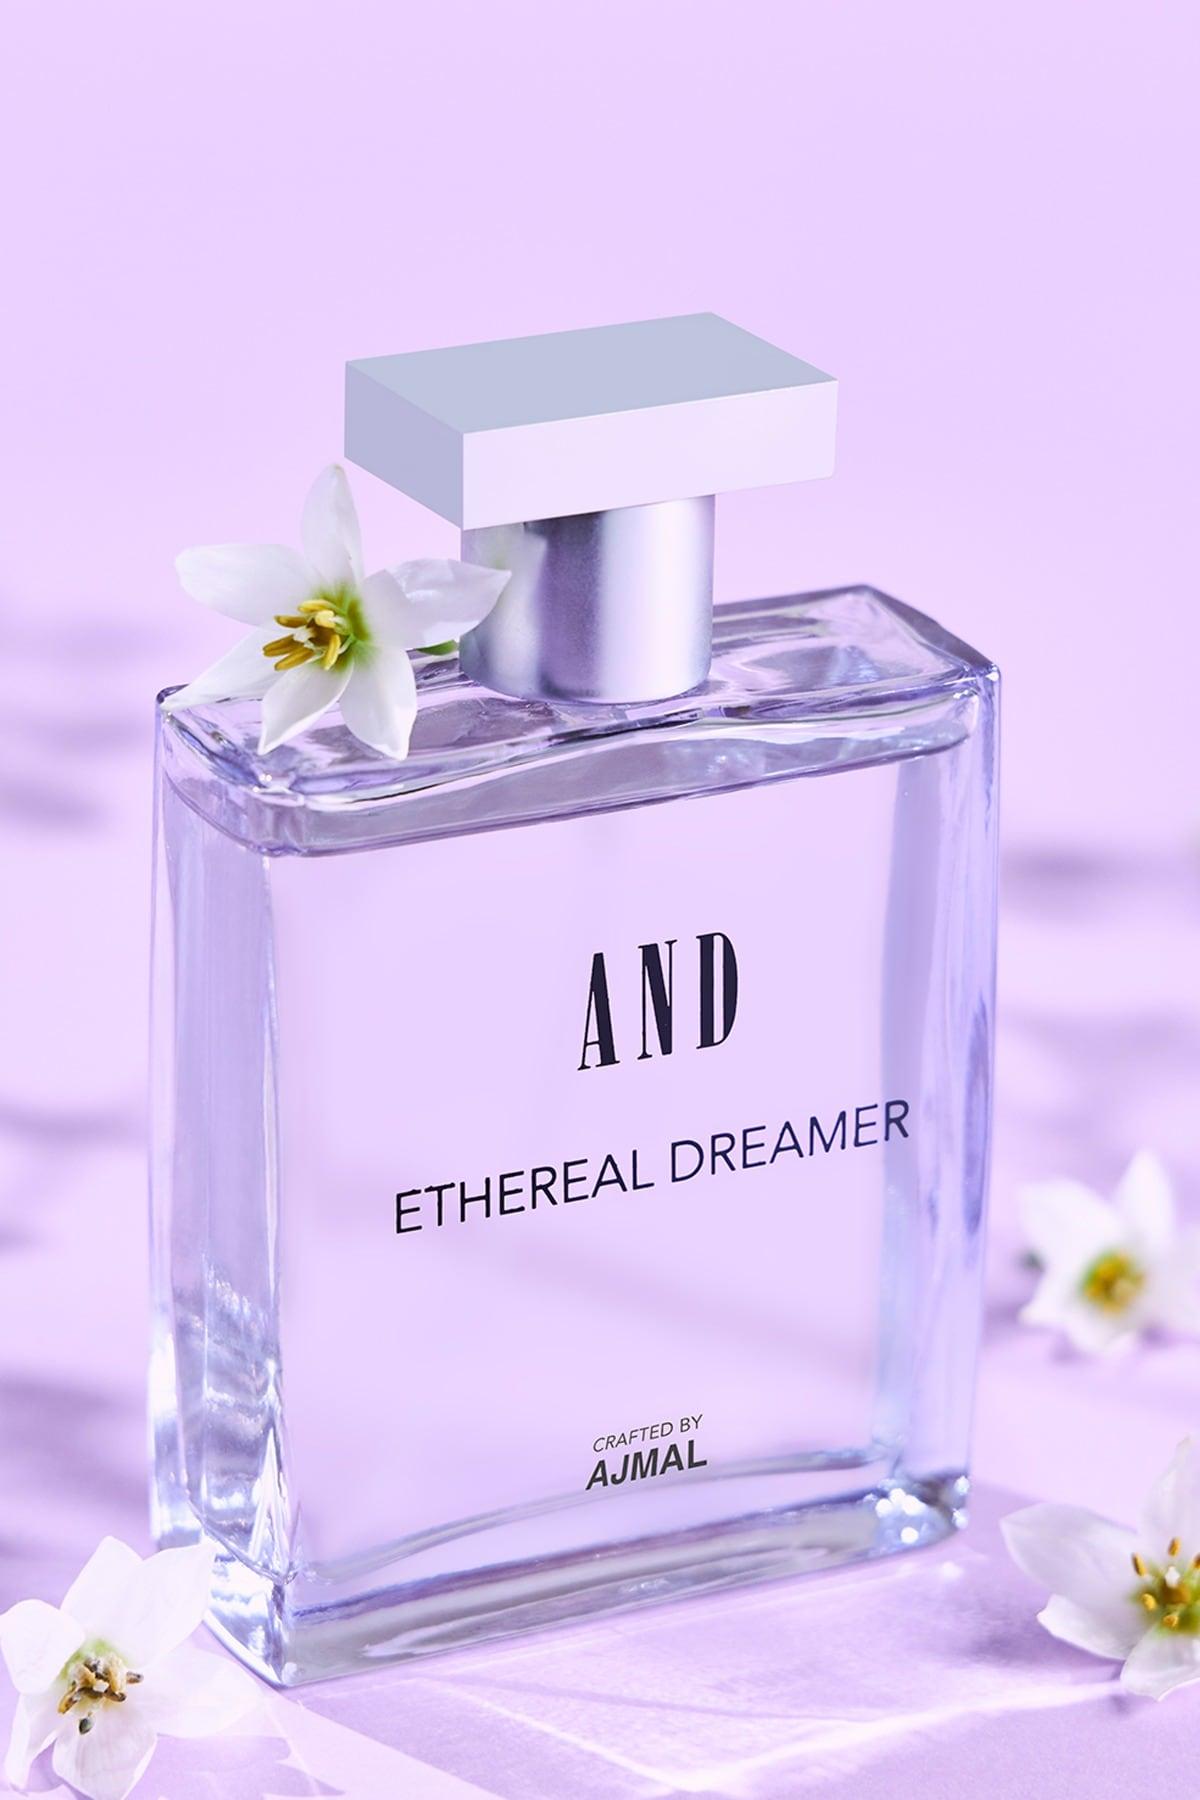 AND | Ethereal Dreamer Fruity Woody Eau De Parfum